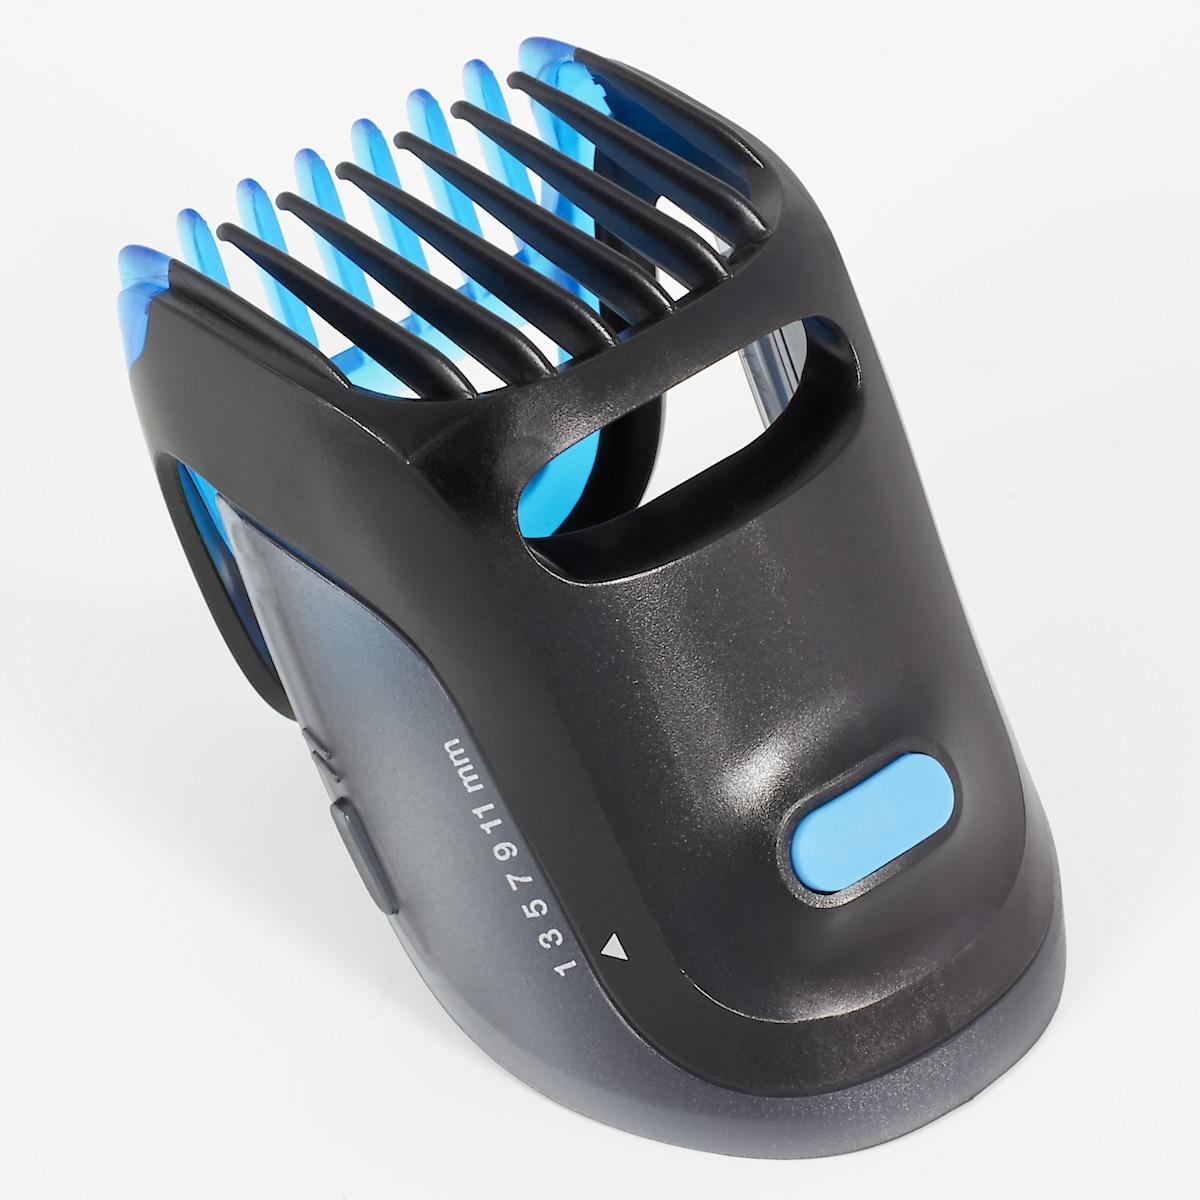 Comb Braun CruZer5